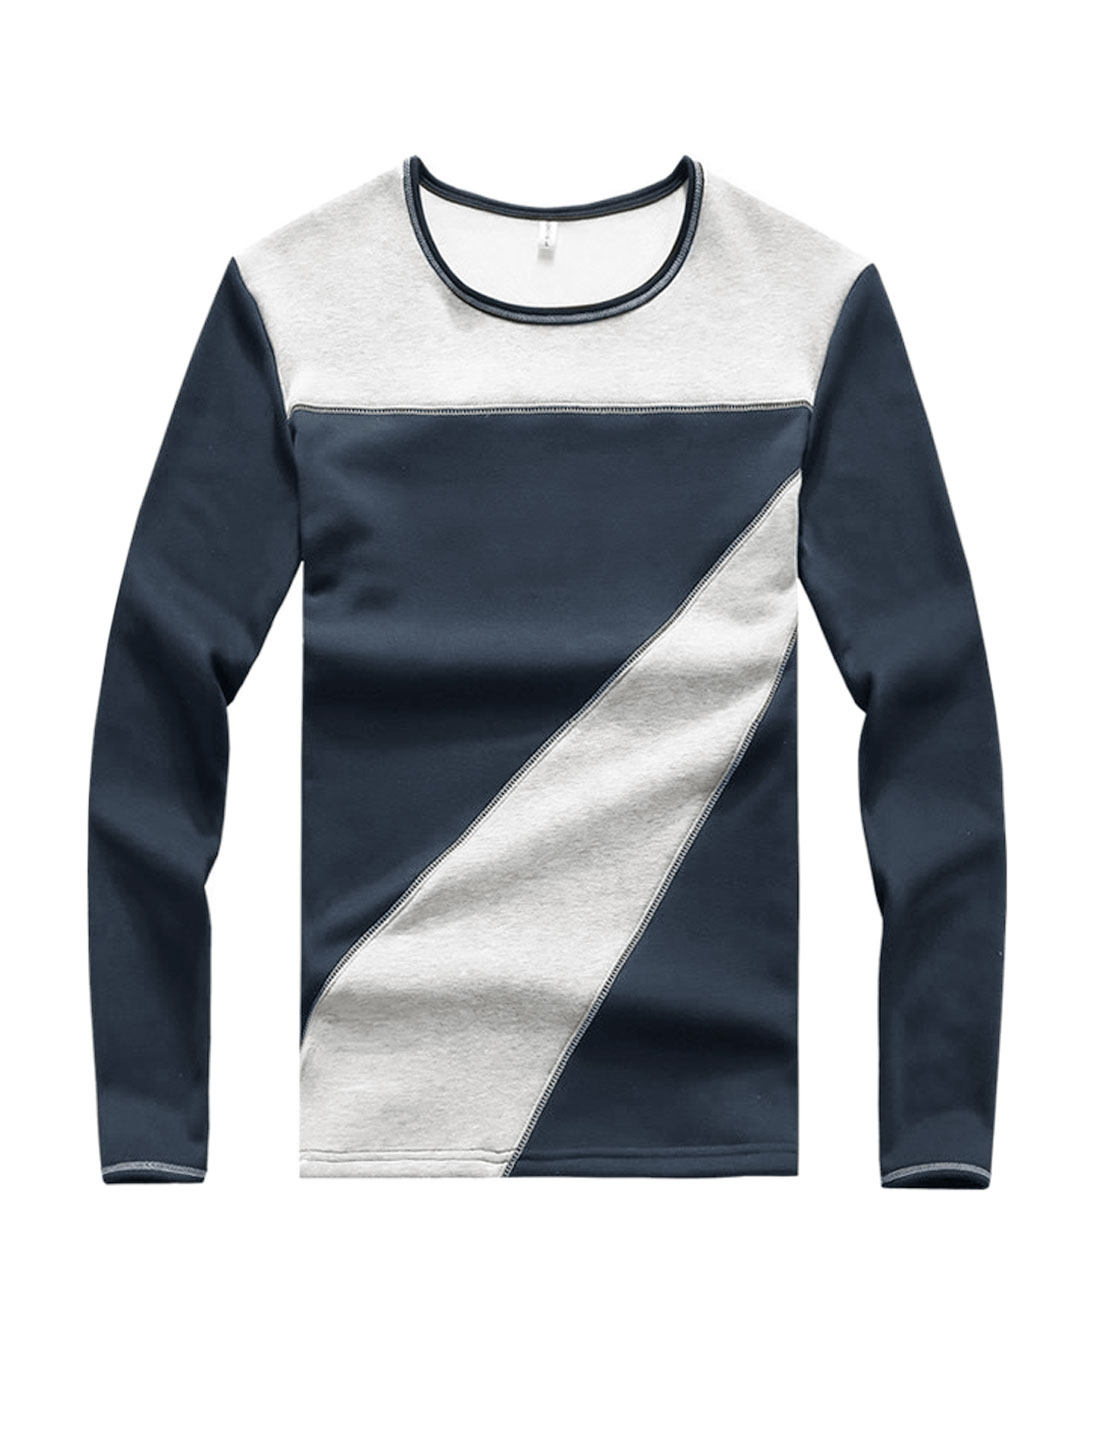 Men Crew Neck Long Sleeves Color Block Slim Fit T-Shirt Blue S